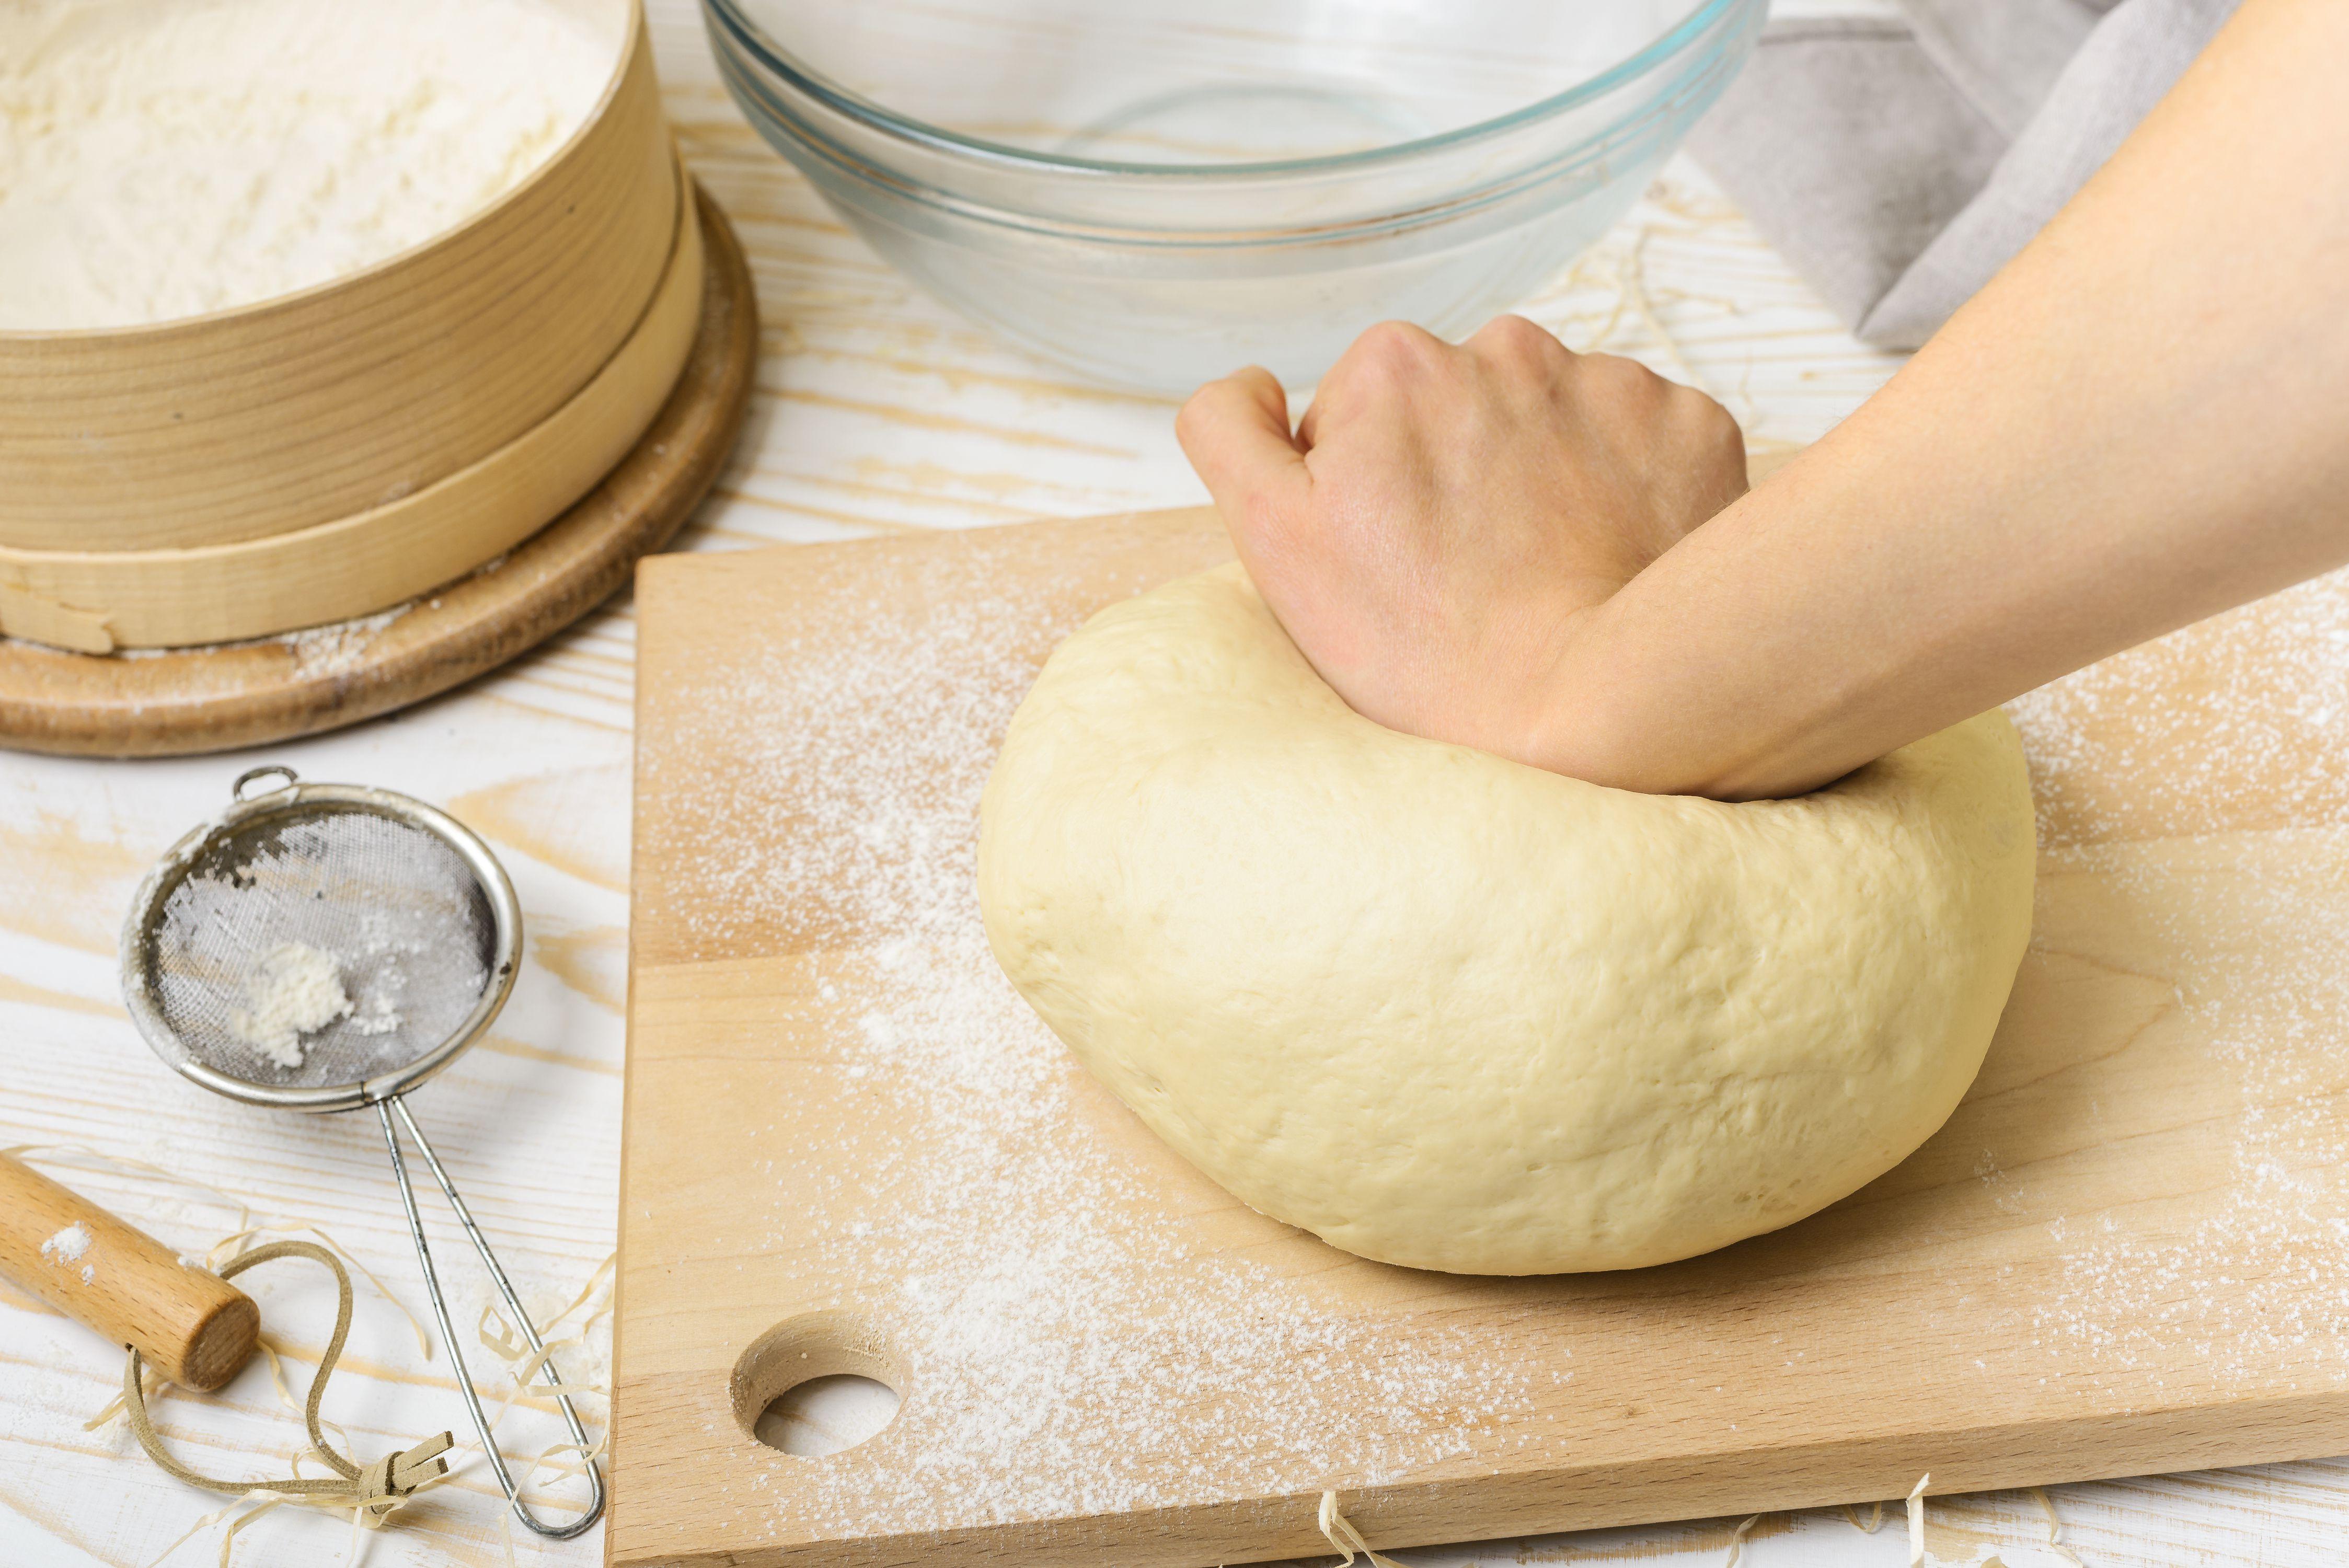 Pressing down on dough